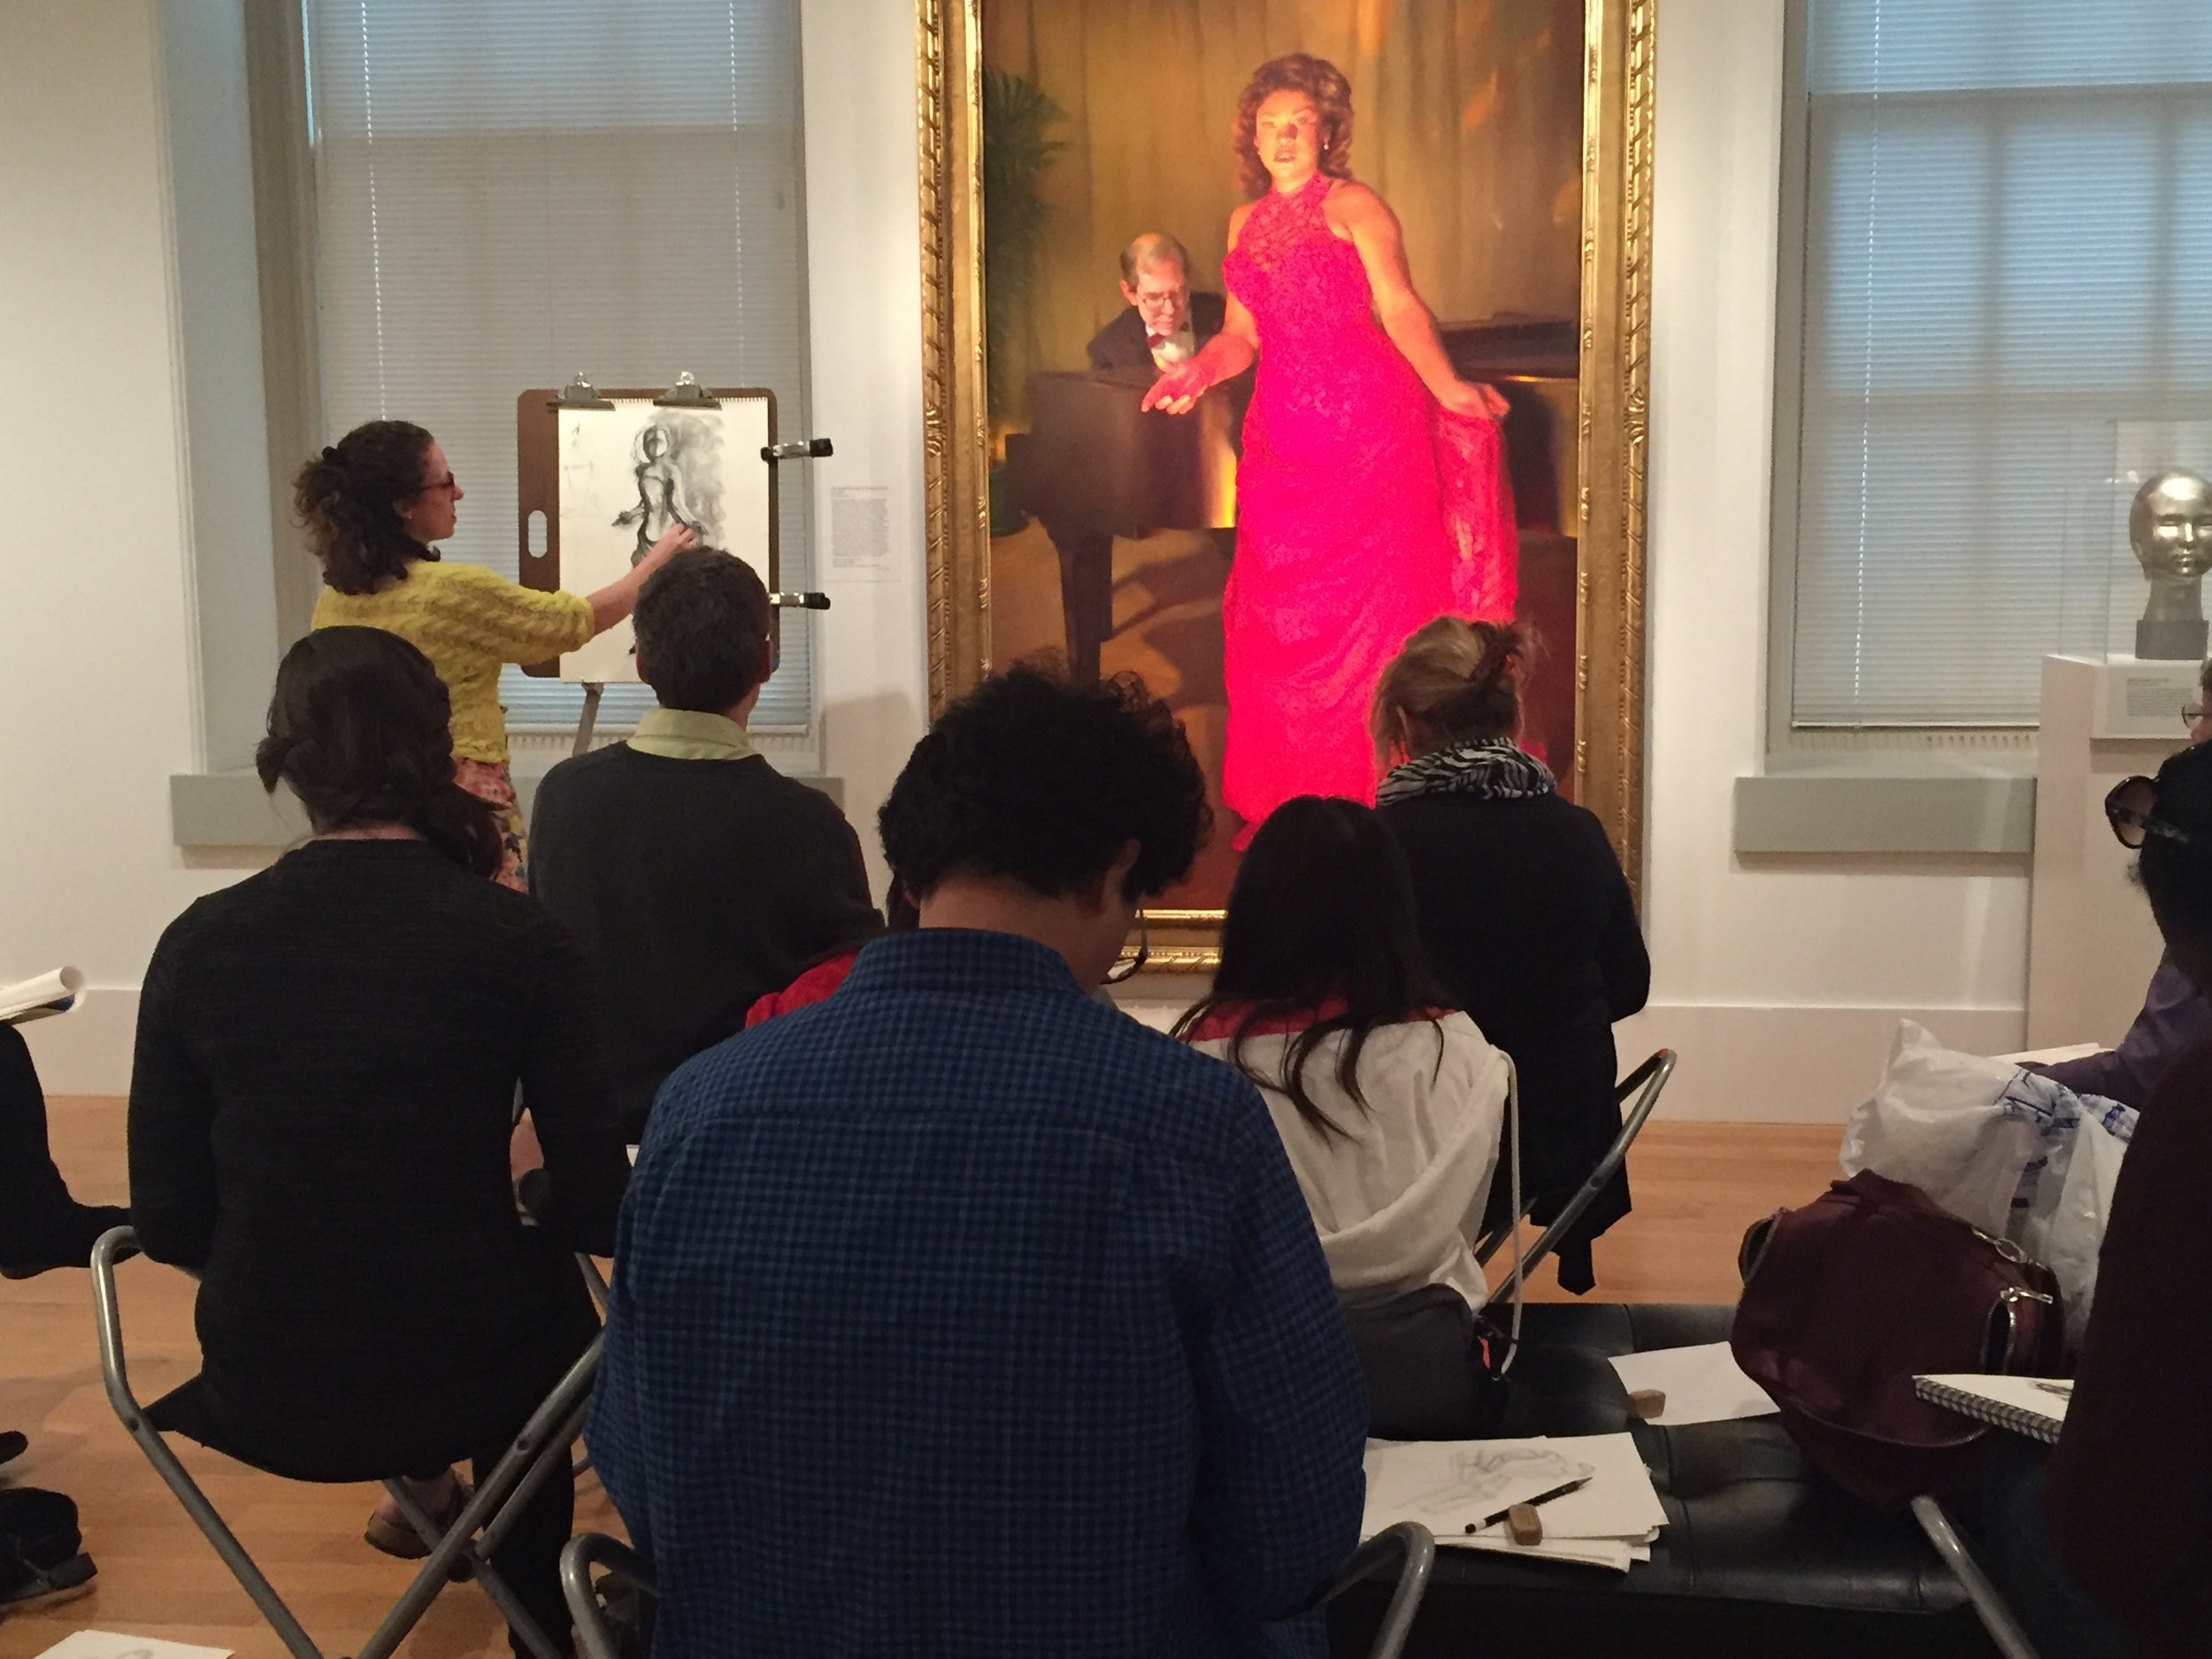 Free Figure Drawing Classes Jj Galloway Art Studio